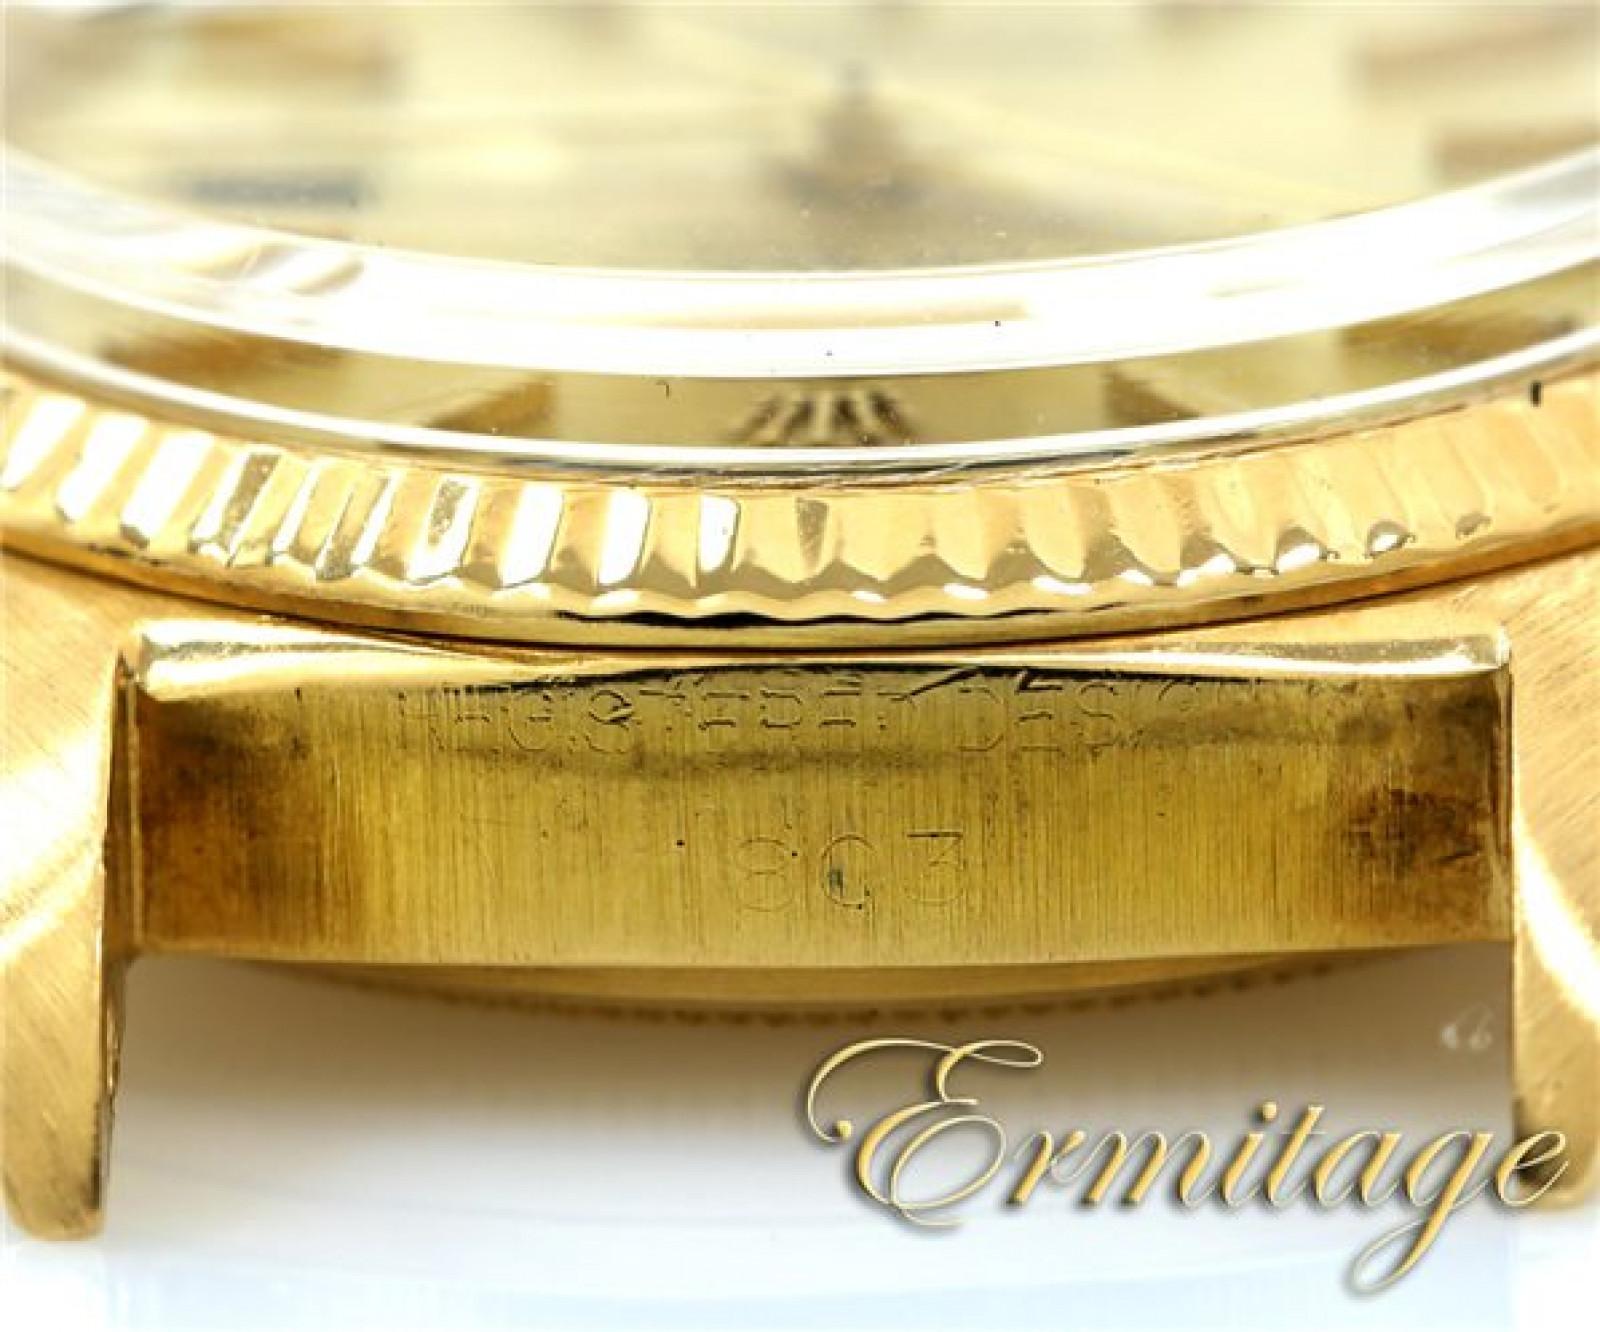 Vintage Rolex Day-Date 1803 Gold Year 1965 1965